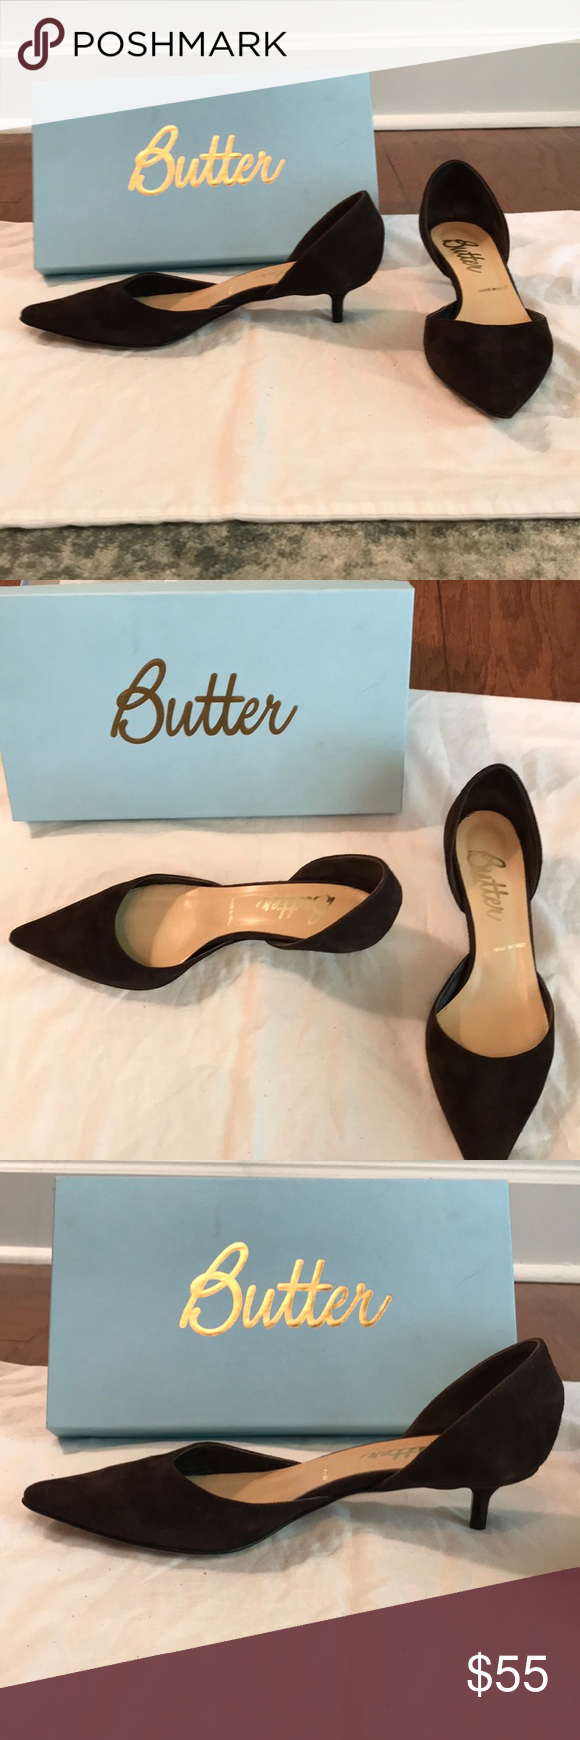 Butter Kitten Heels Shoes 7 5 Kitten Heel Shoes Kitten Heels Butter Shoes